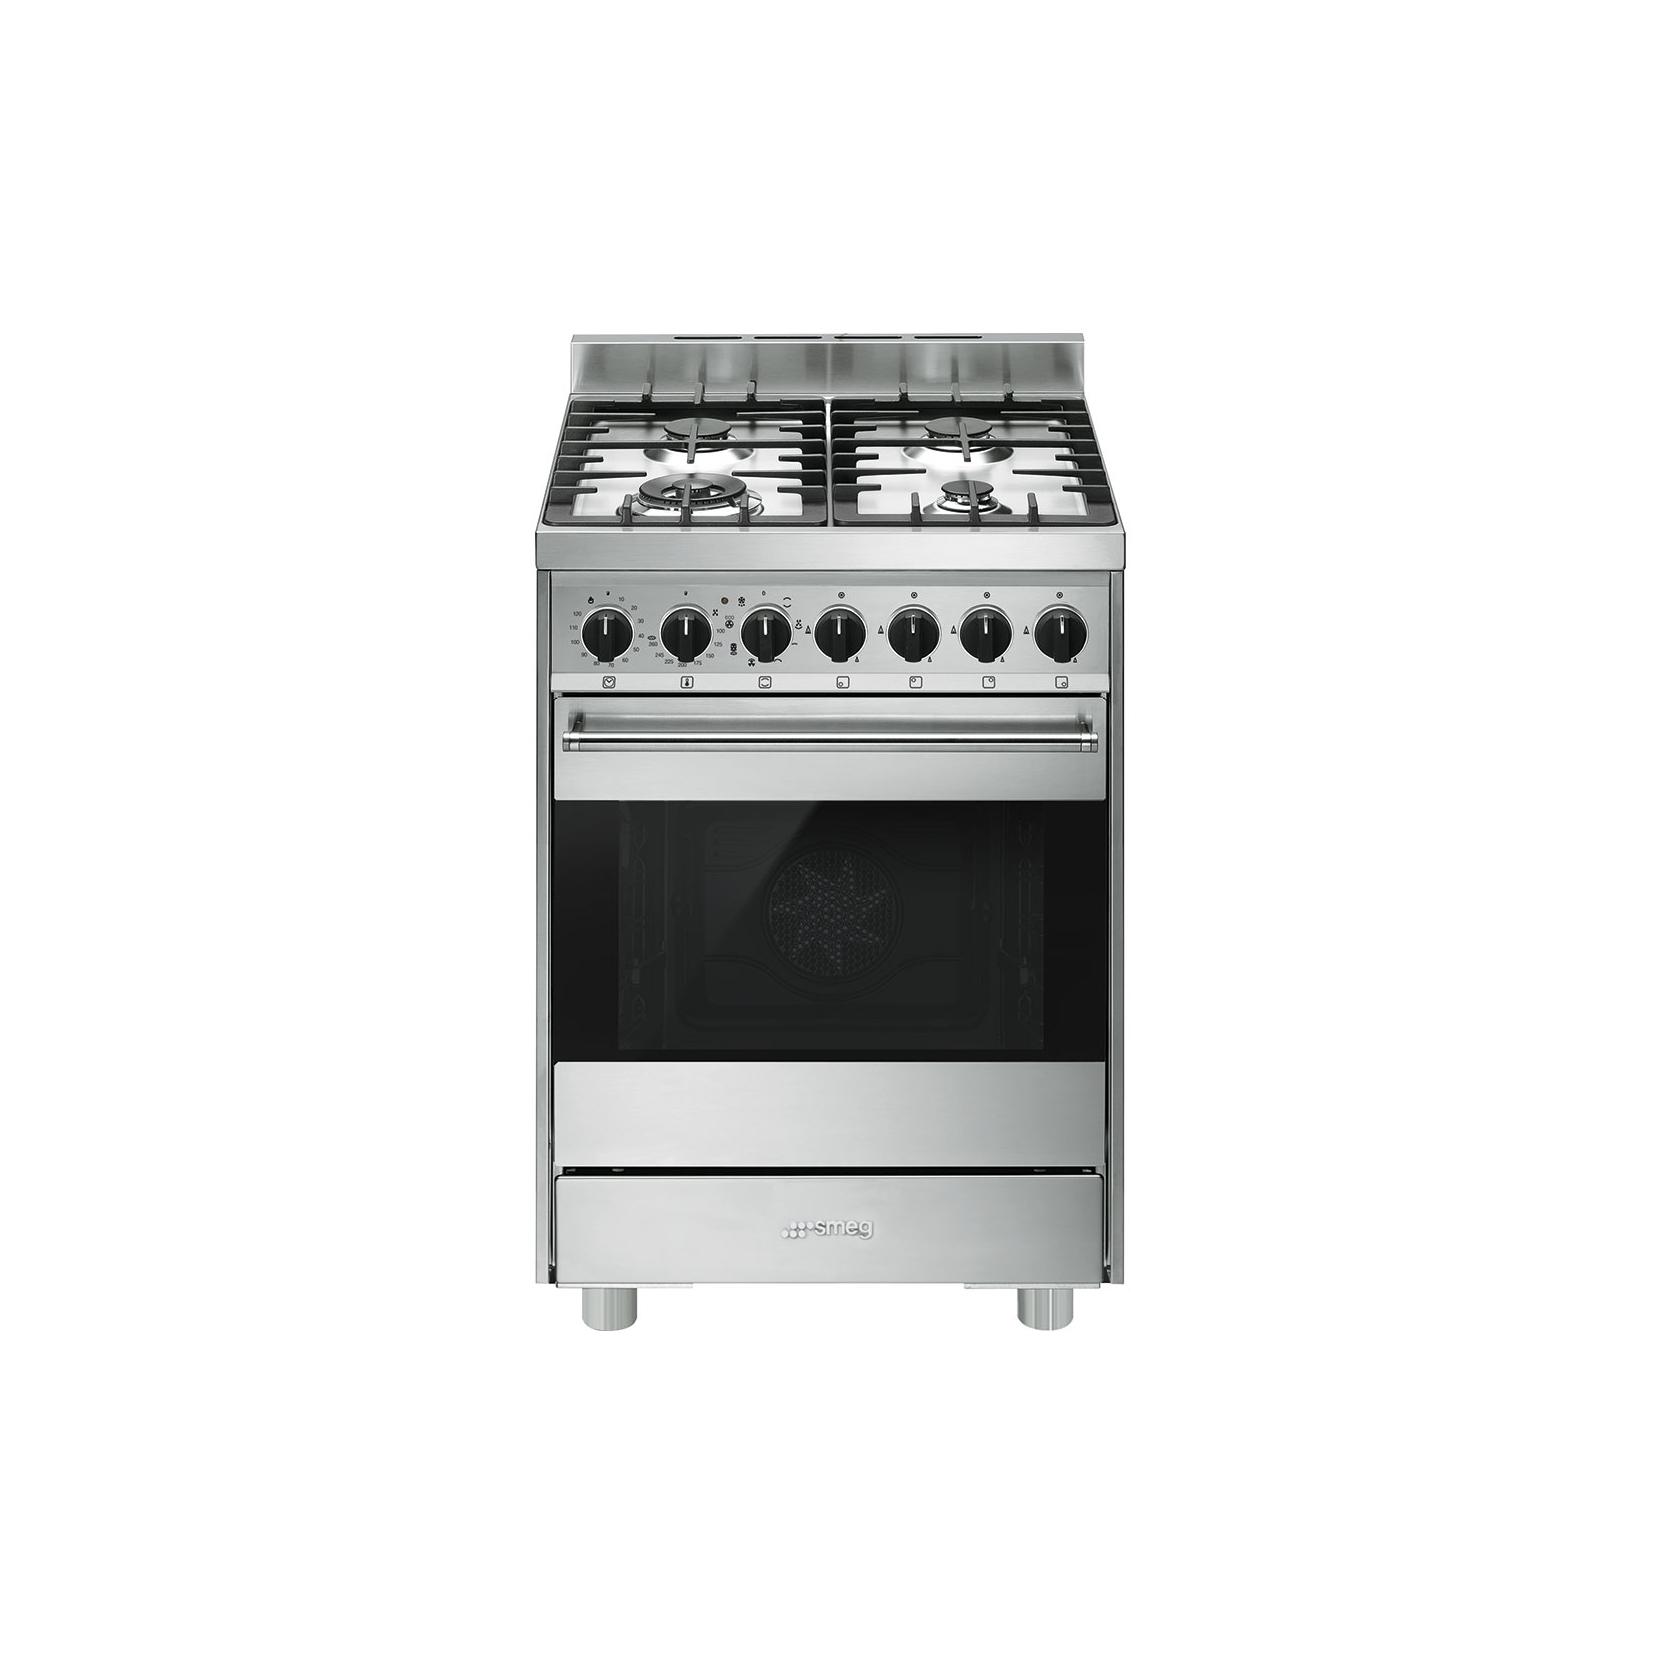 Smeg b6gmxi9 cucina a gas forno elettrico multifunzione - Cucine a gas con forno elettrico ...